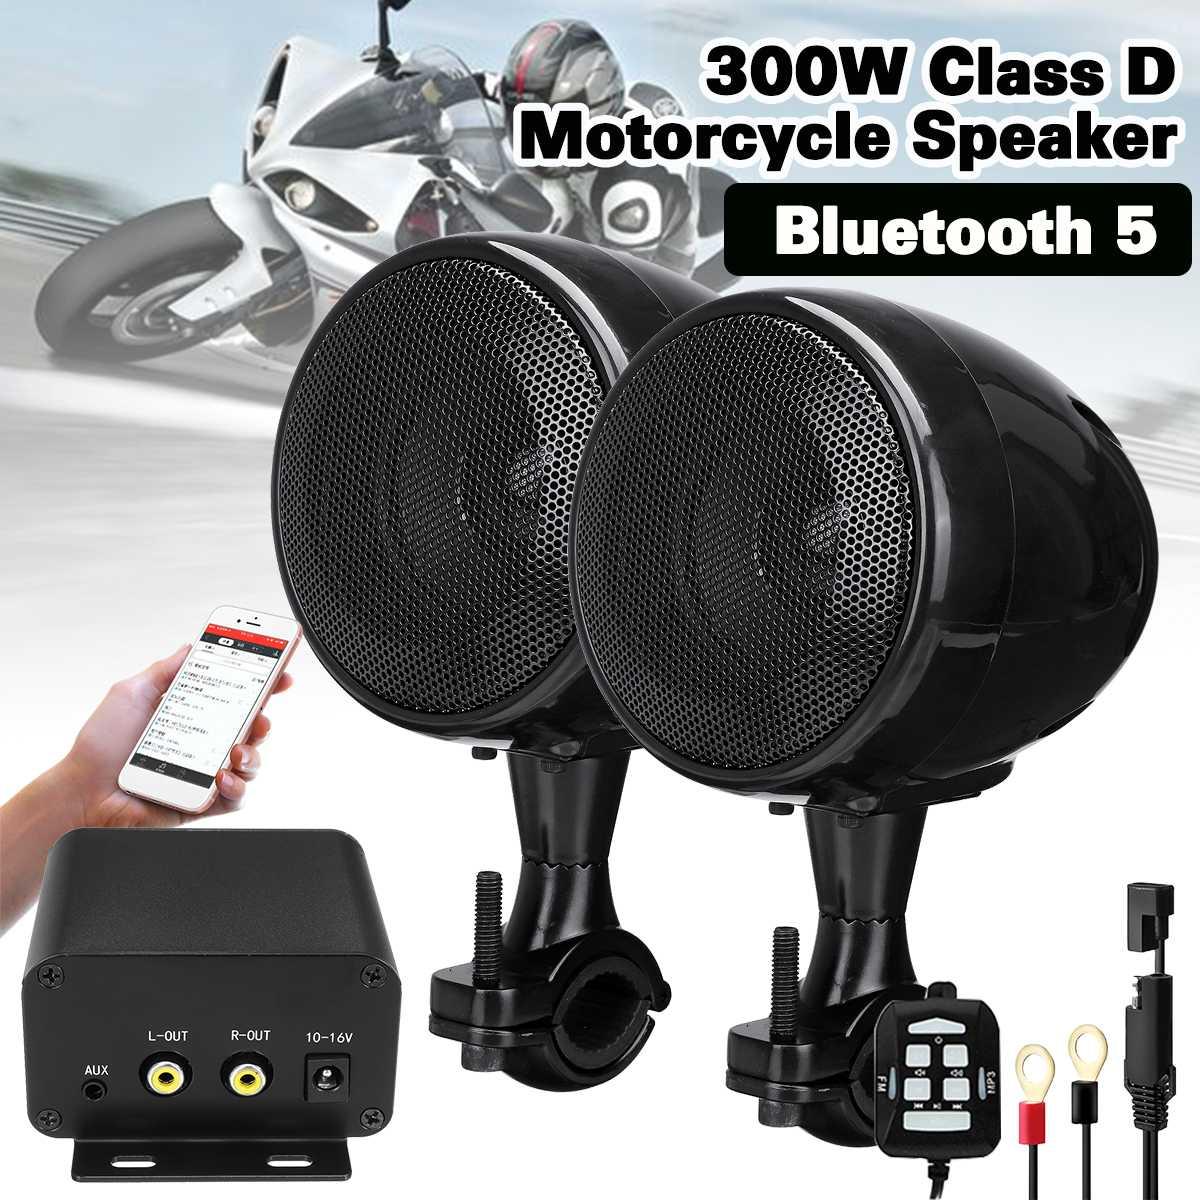 300W Waterproof 5.0 Motorcycle Speakers Audio Stereo Speaker Amplifier System With Bluetooth Function ATV Sound System300W Waterproof 5.0 Motorcycle Speakers Audio Stereo Speaker Amplifier System With Bluetooth Function ATV Sound System